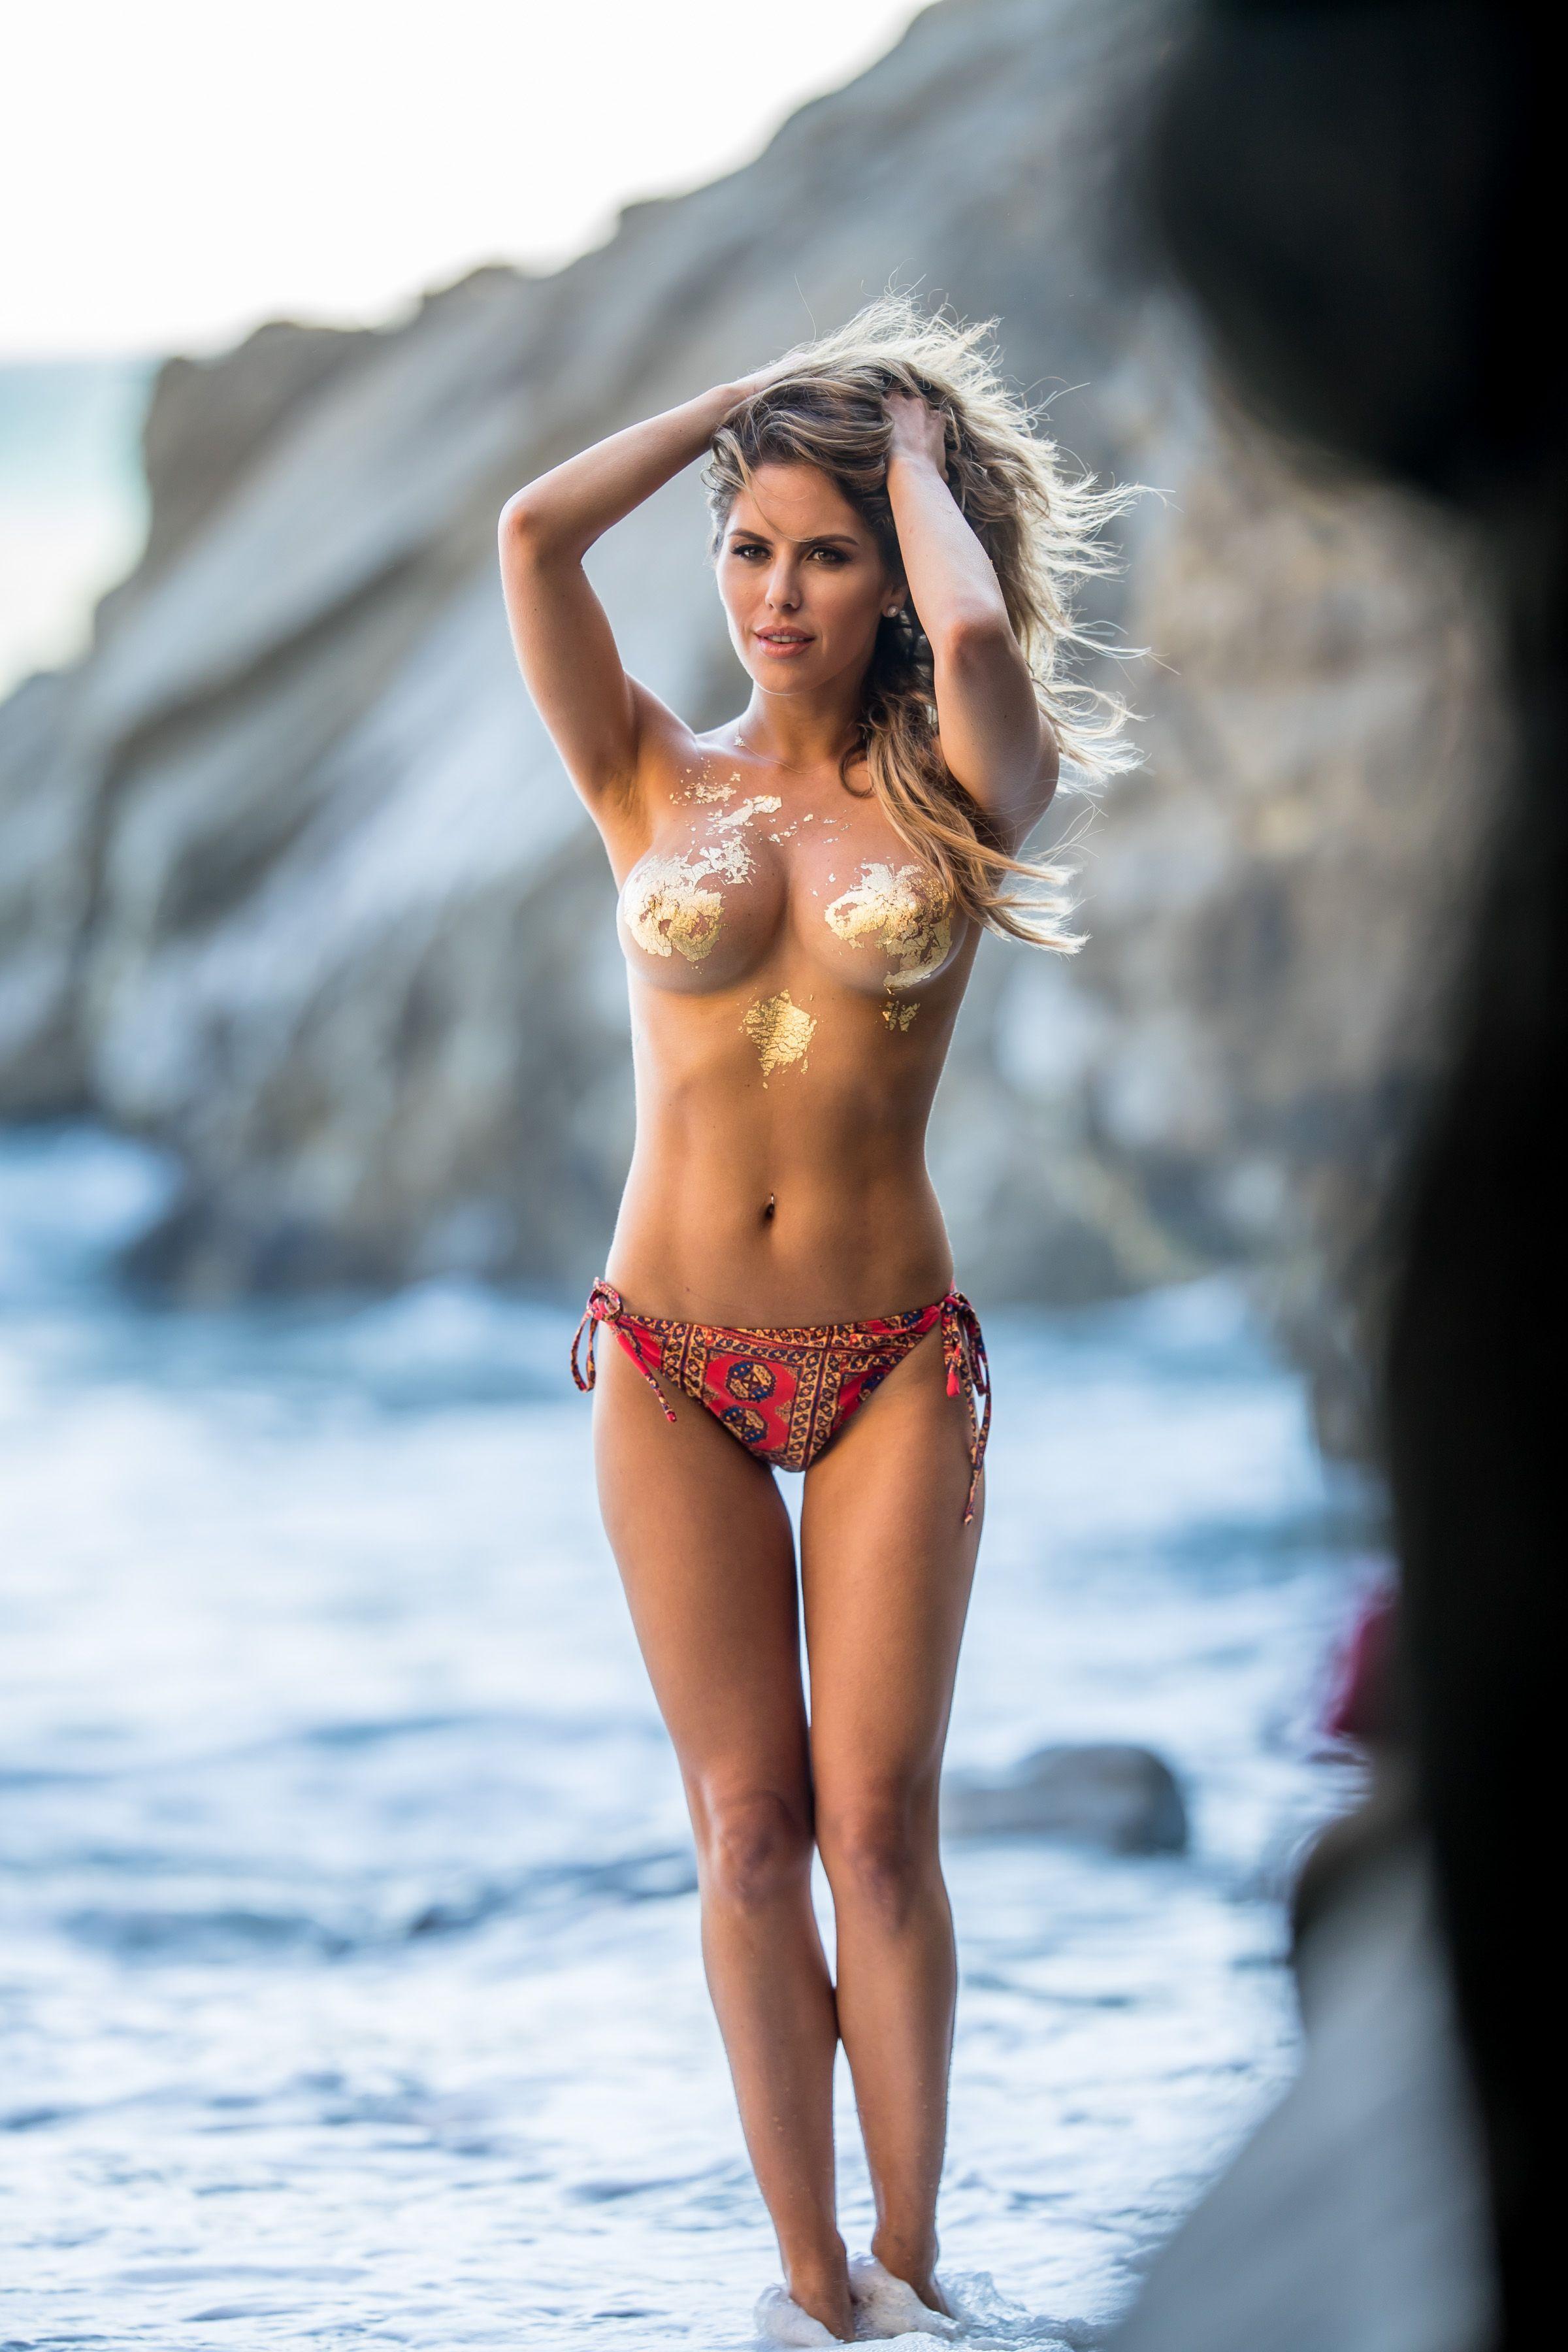 Brittney-Palmer-Sexy-Topless-6-thefappeningblog.com_.jpg